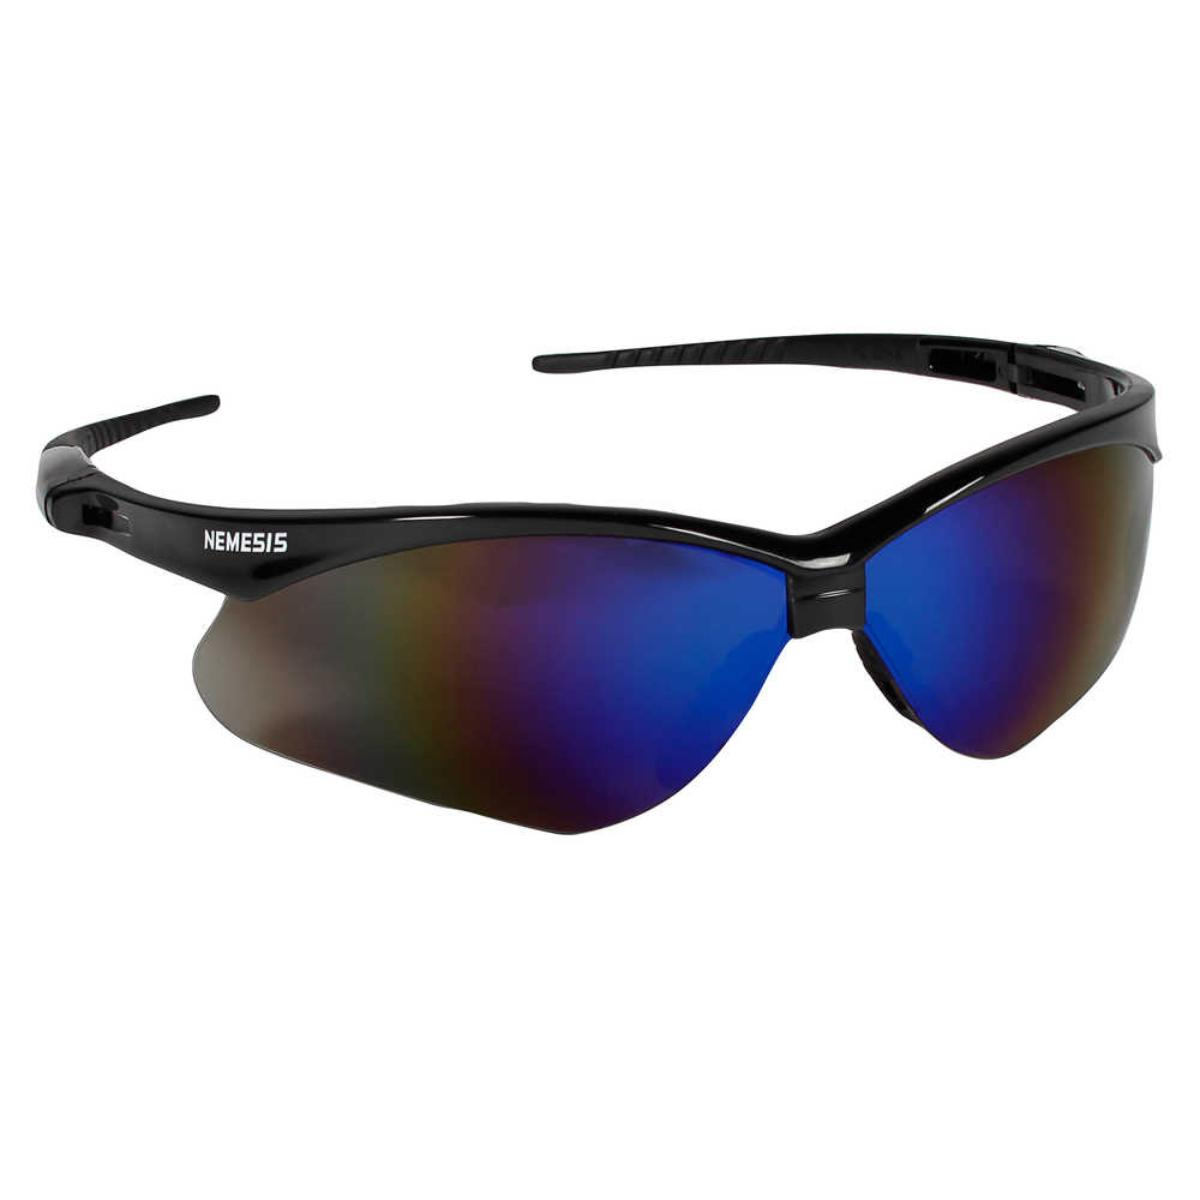 Jackson Safety V30 Nemesis Safety Glasses (14481), Blue Mirror Lenses with Black Frame, 12 Pairs / Case